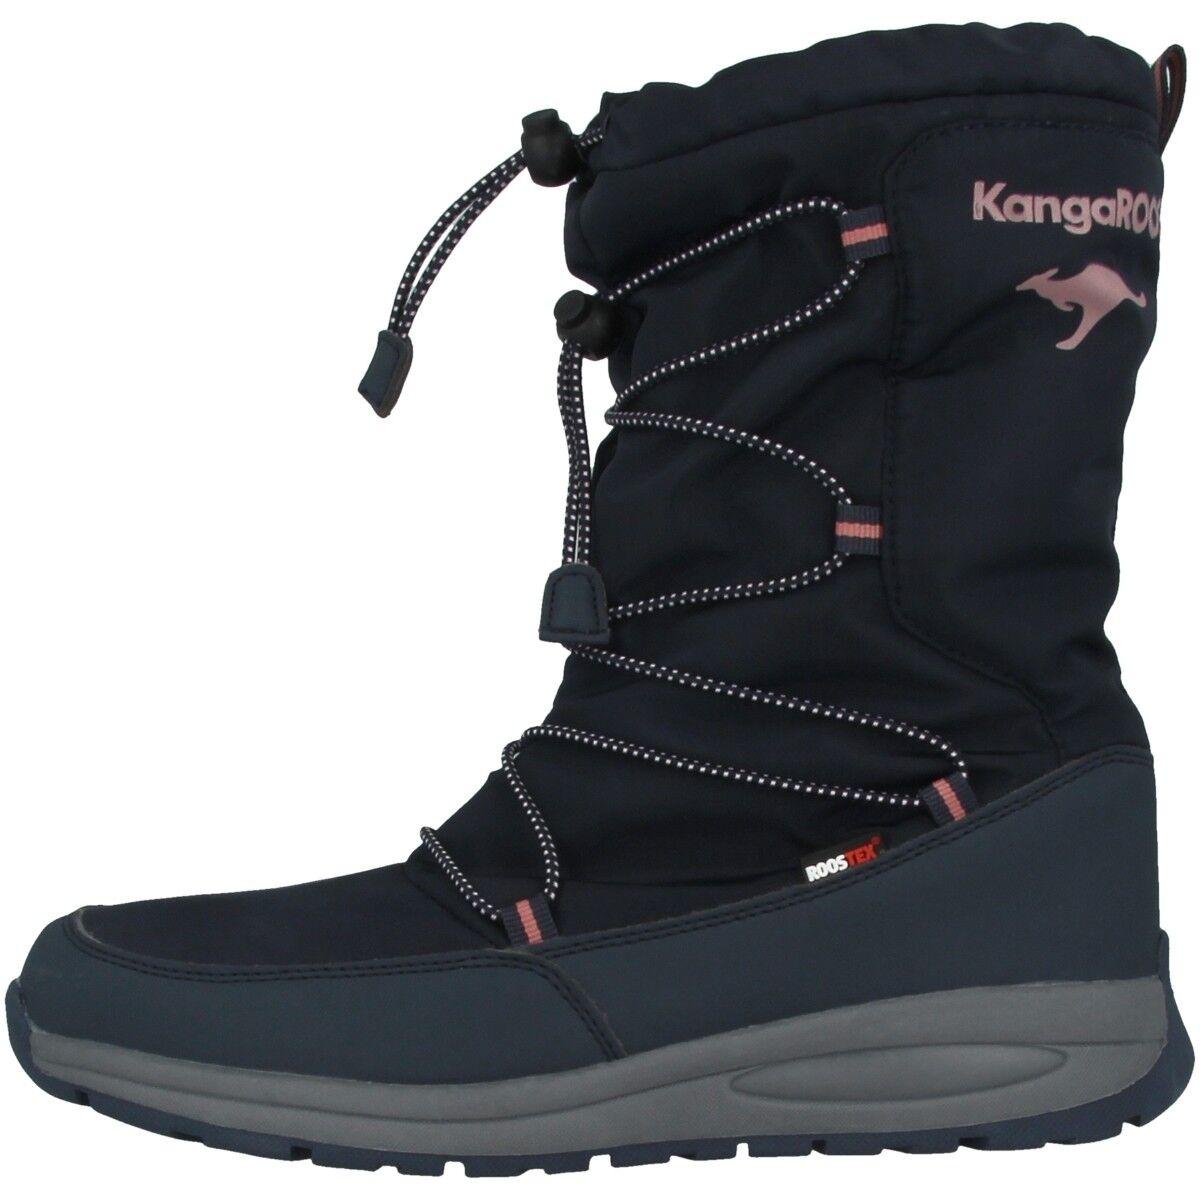 Kangaroos K-Flake Rtx shoes Stivali Stivaletti Invernali 18285-4058